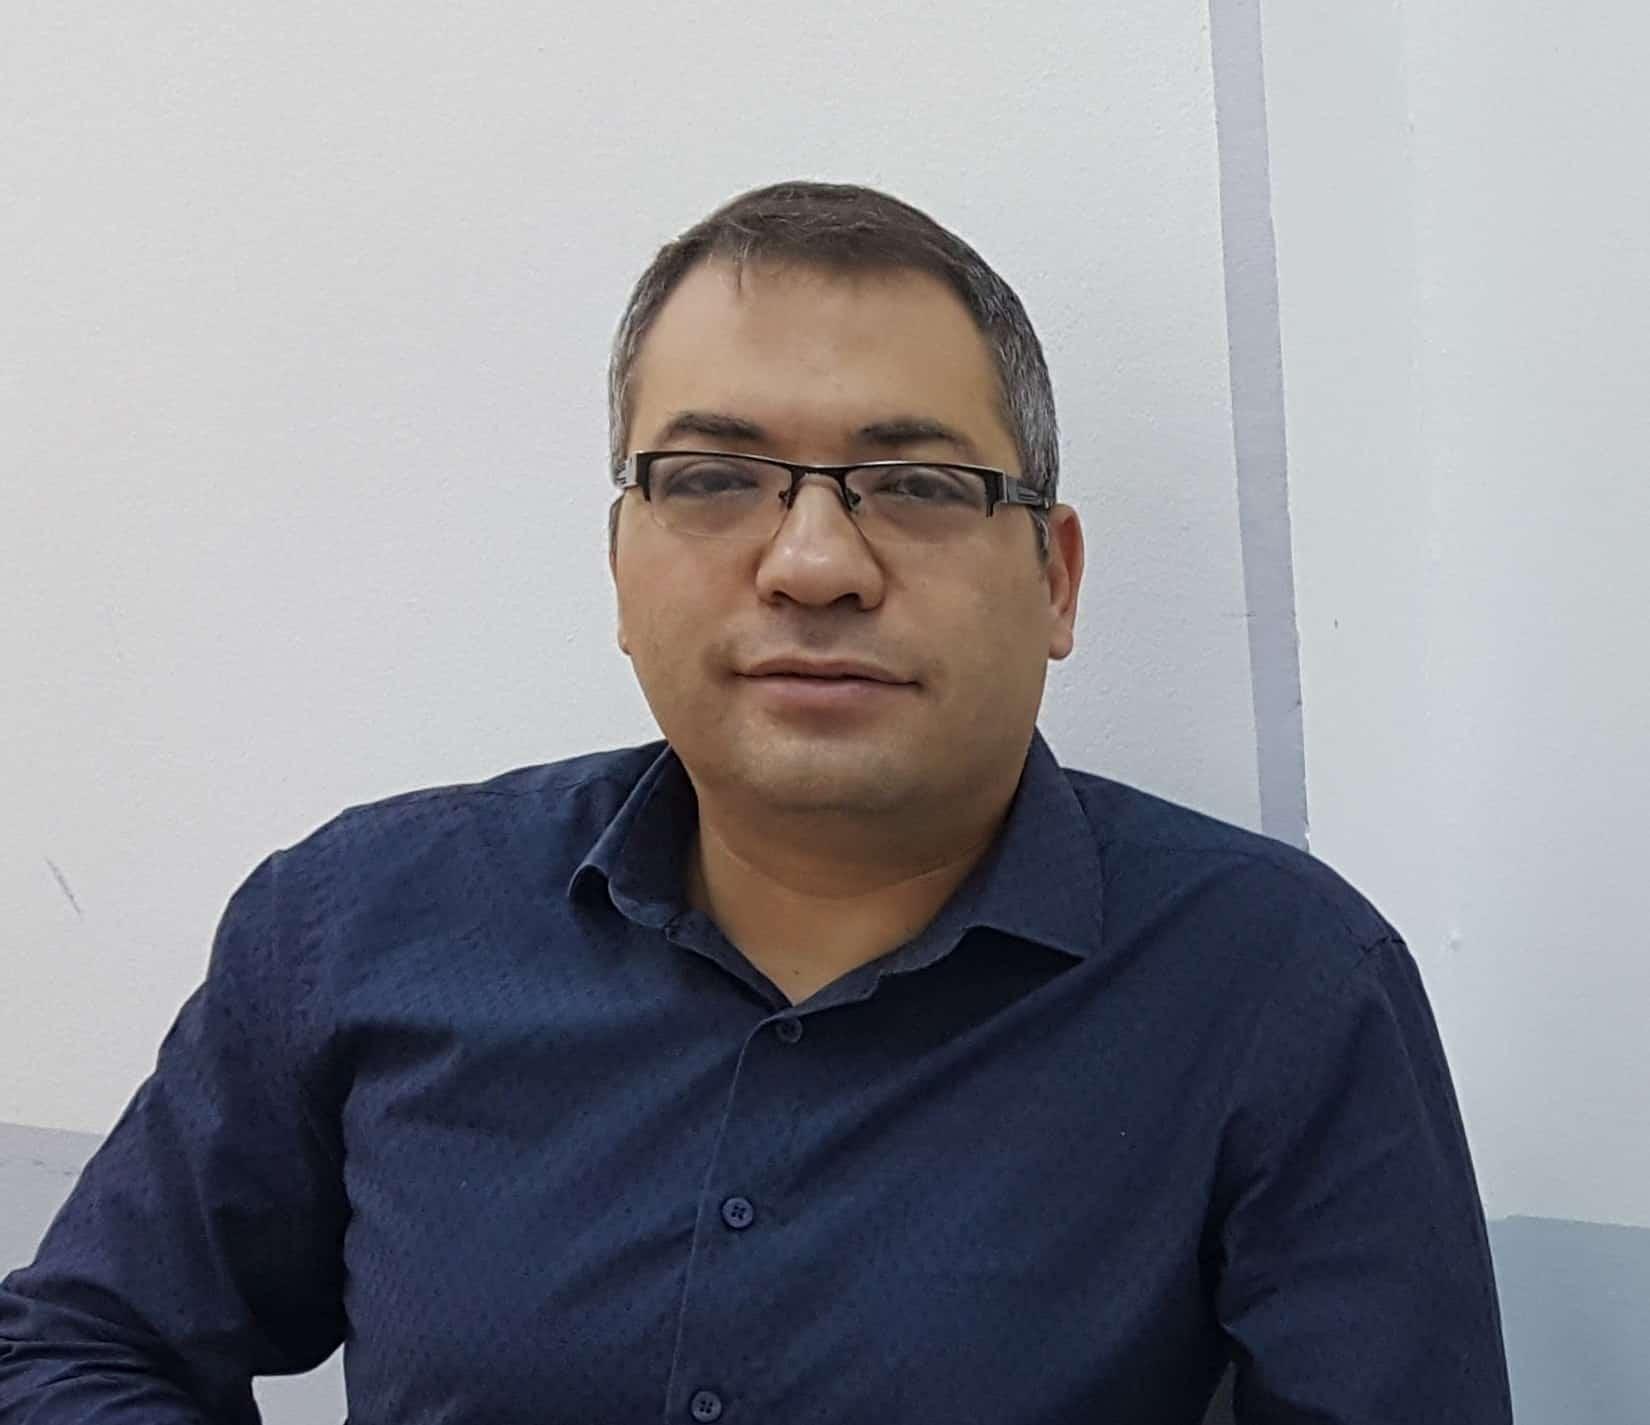 Suleyman Salihler